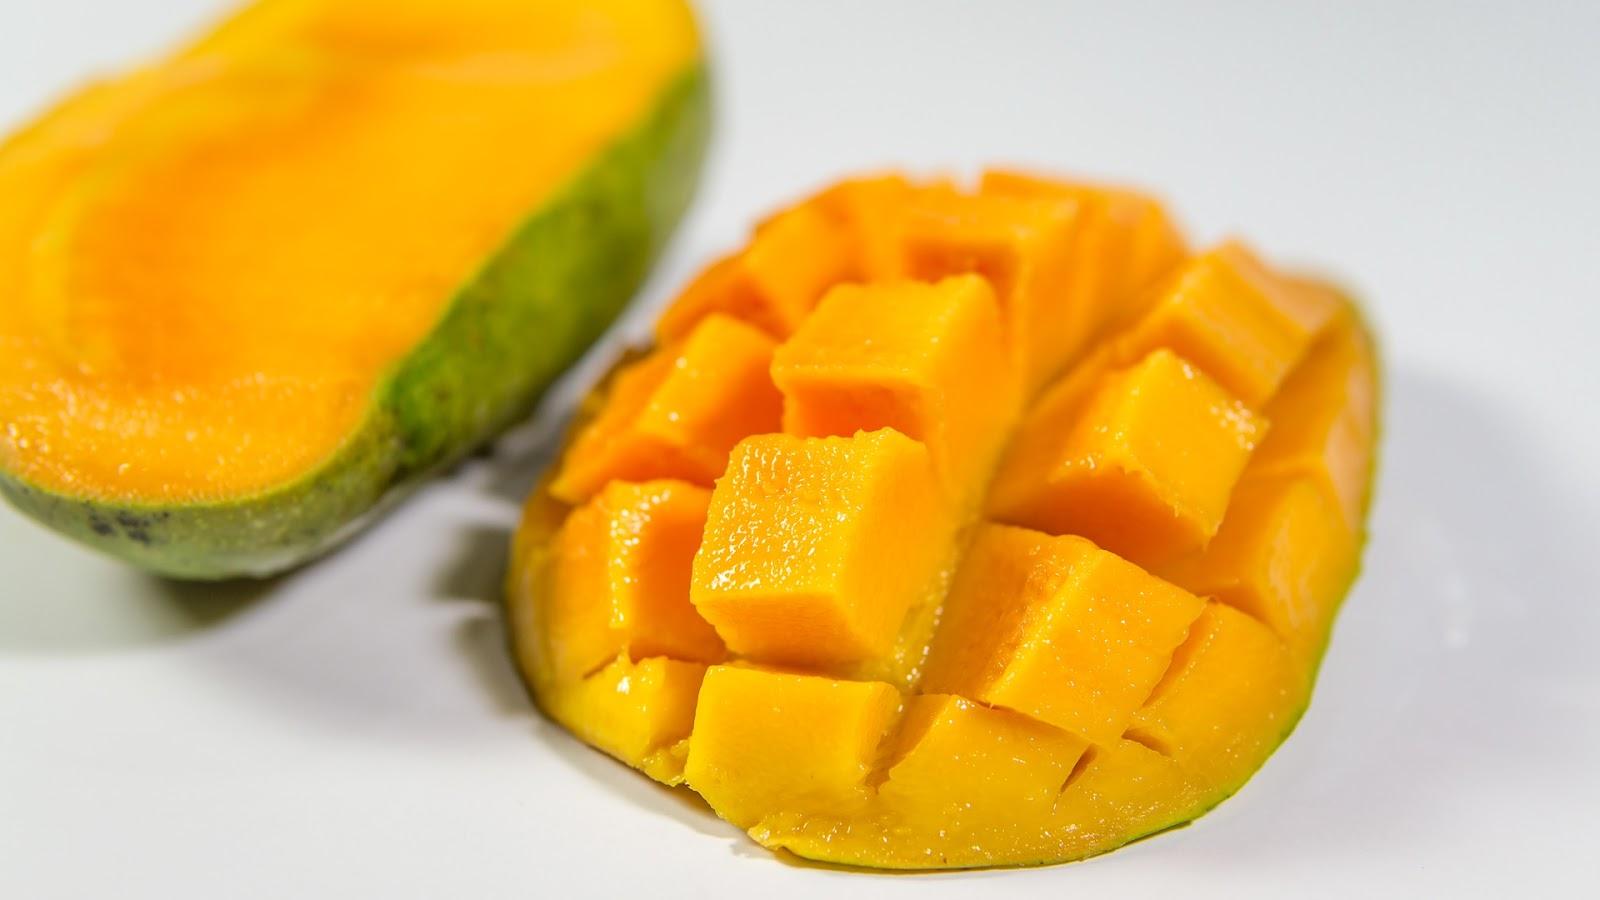 Half sliced Mango background